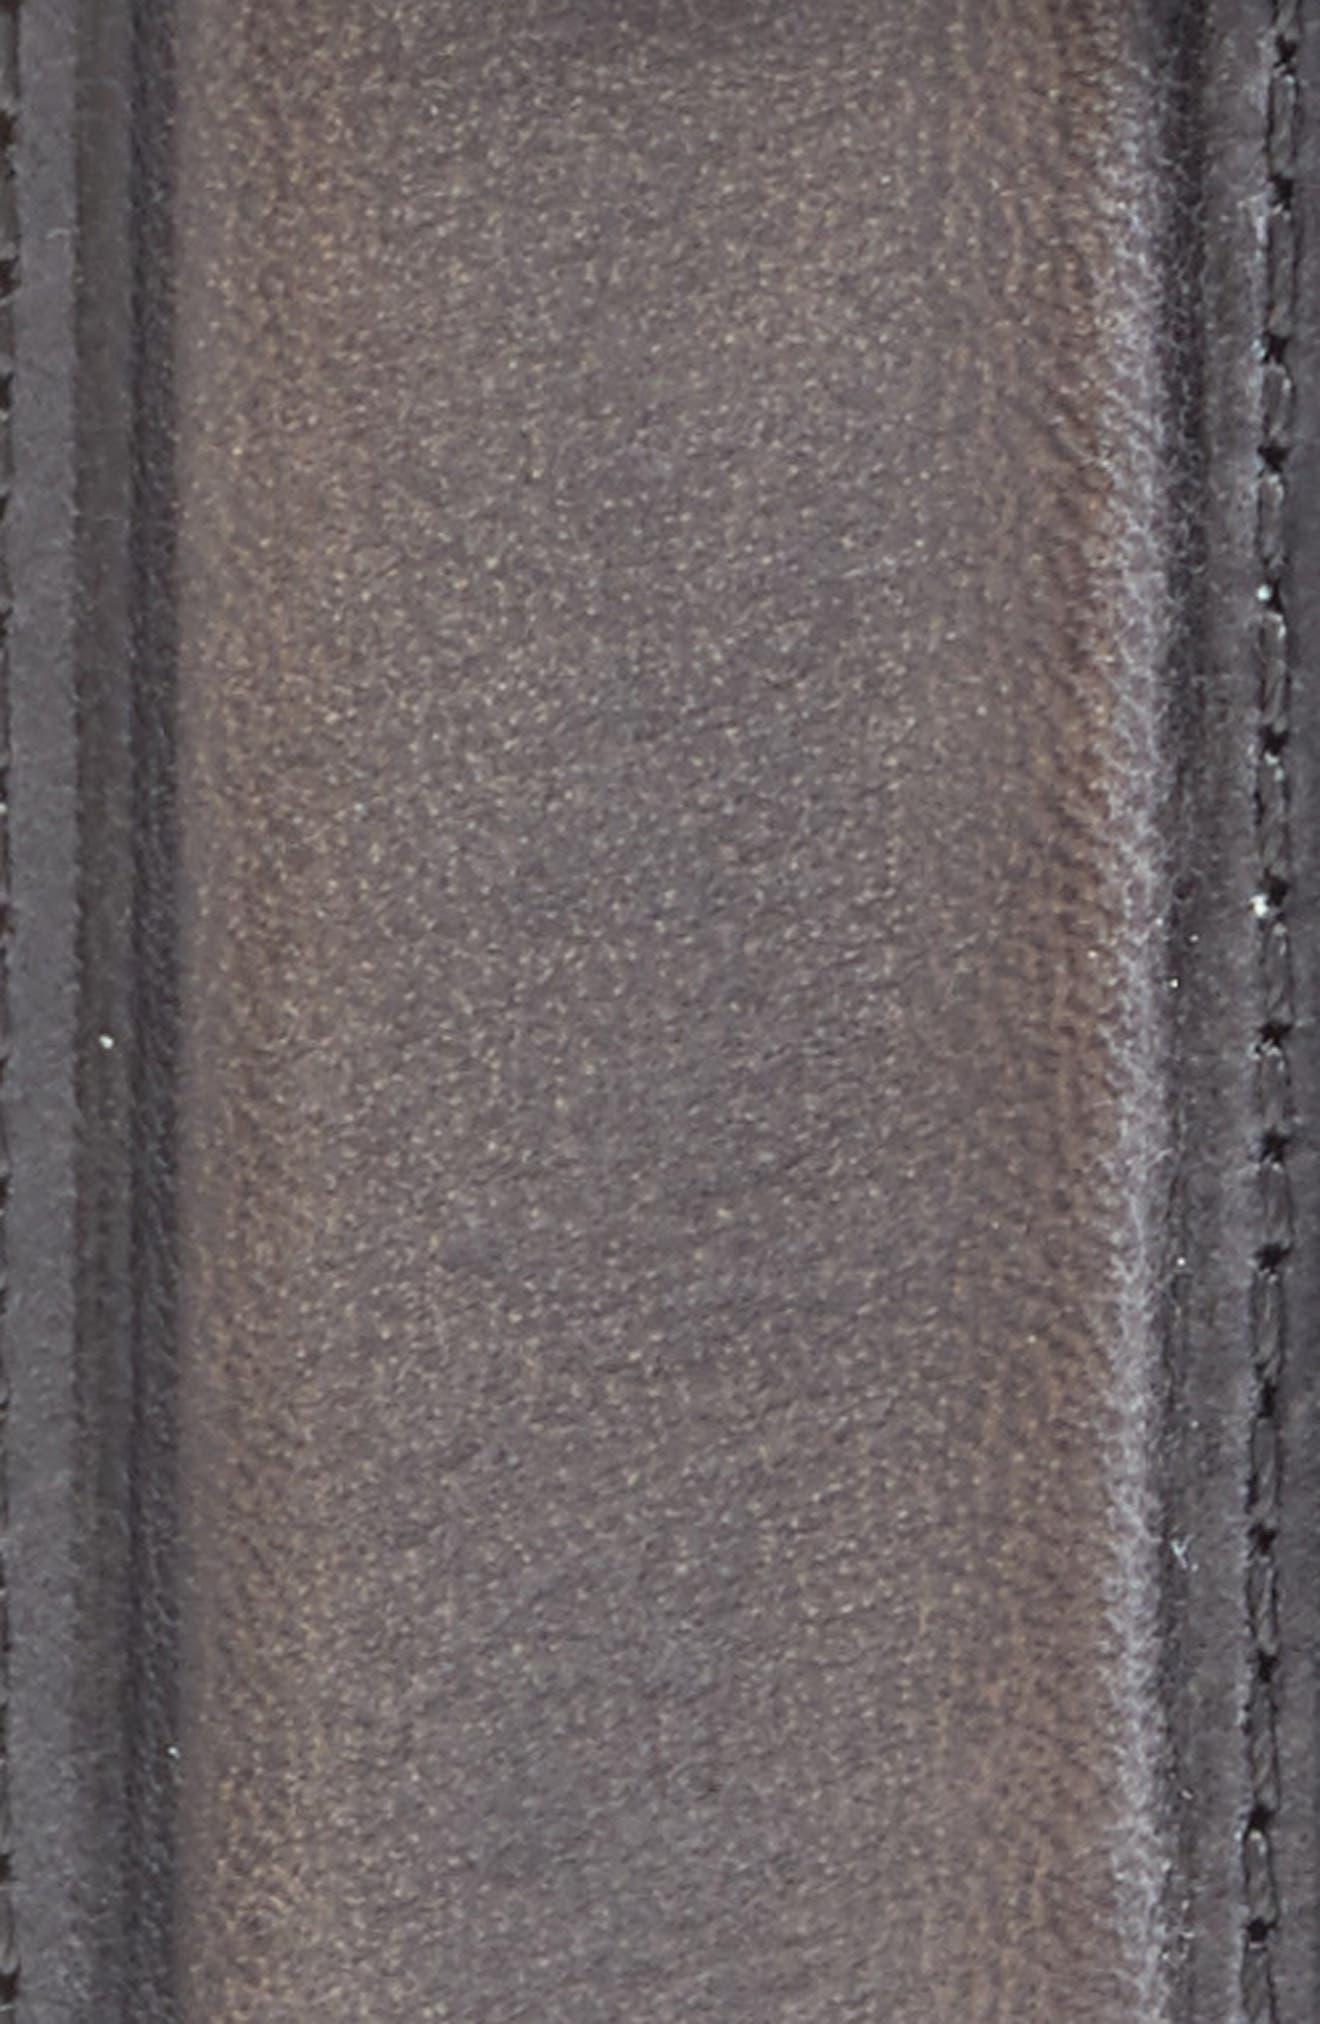 Pressed Edge Leather Belt,                             Alternate thumbnail 2, color,                             STORM CLOUD